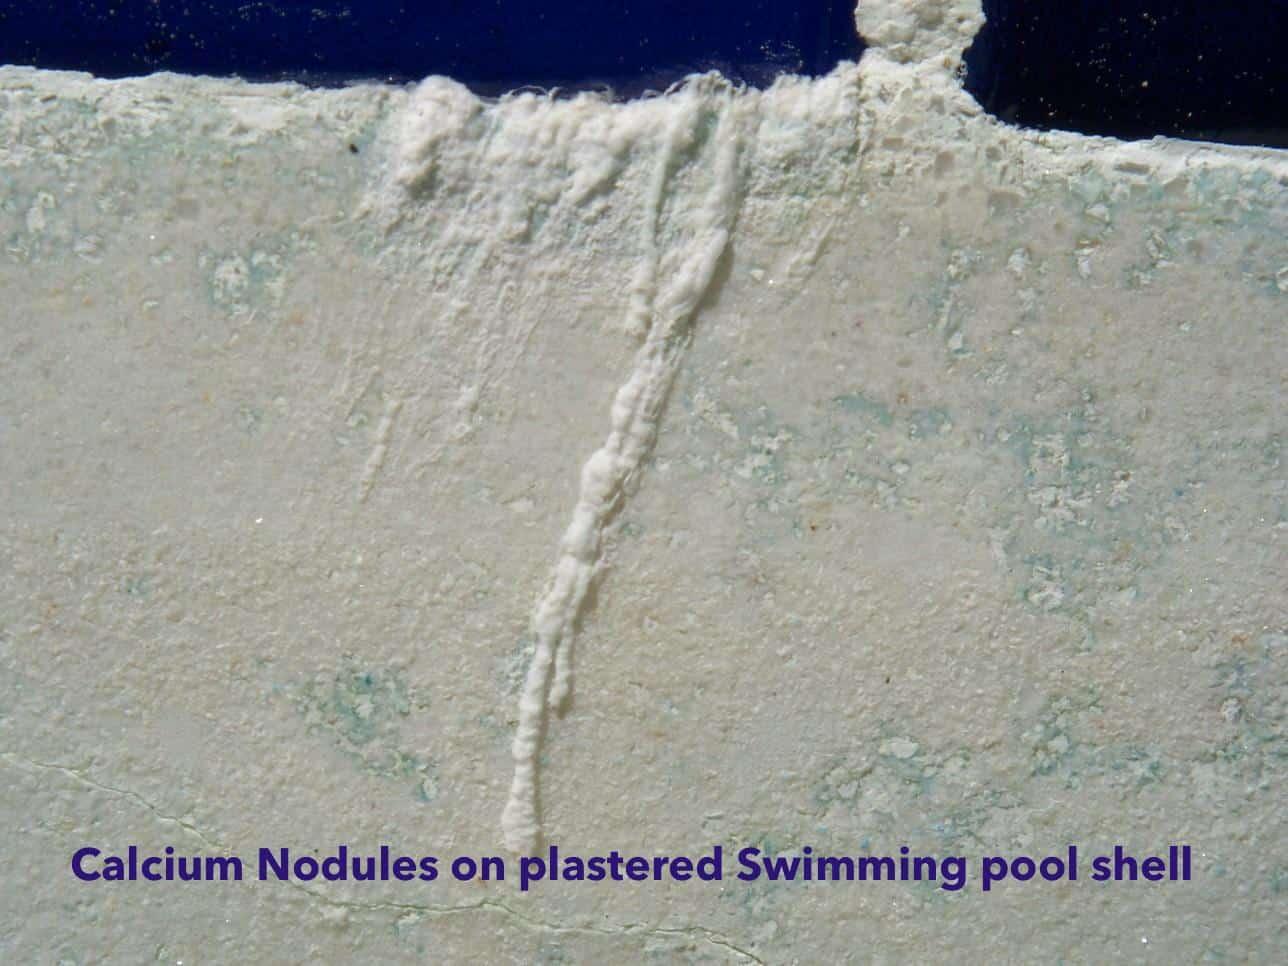 Calcium Nodules on pool surface